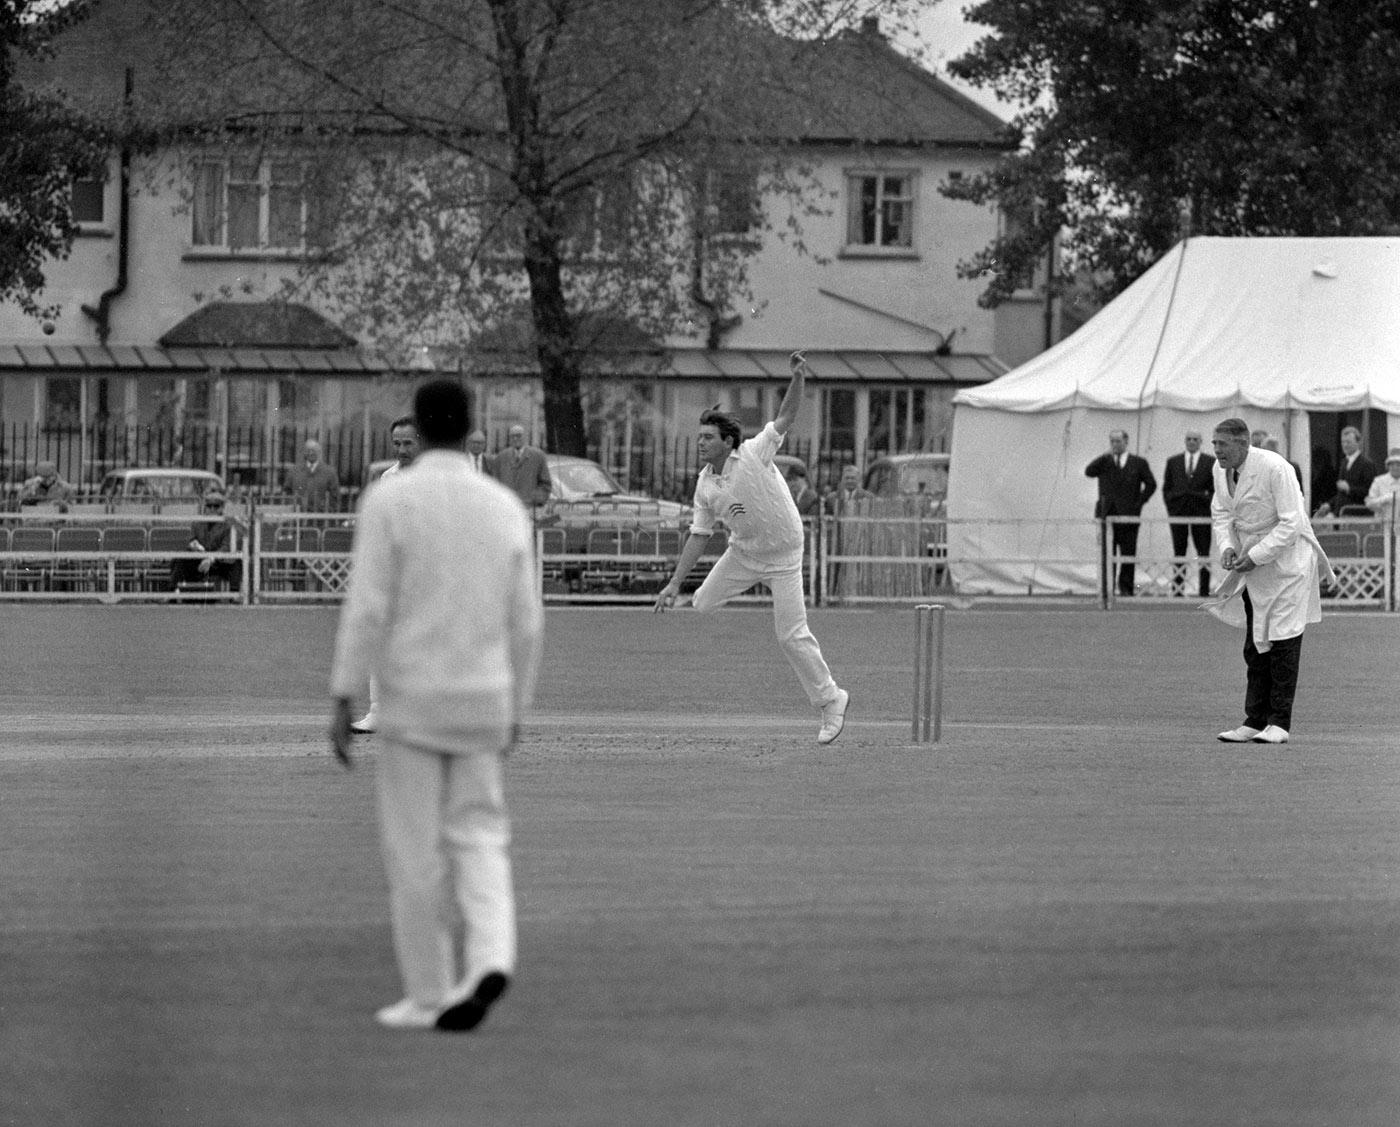 Robin Hobbs bowls against Glamorgan in Ilford